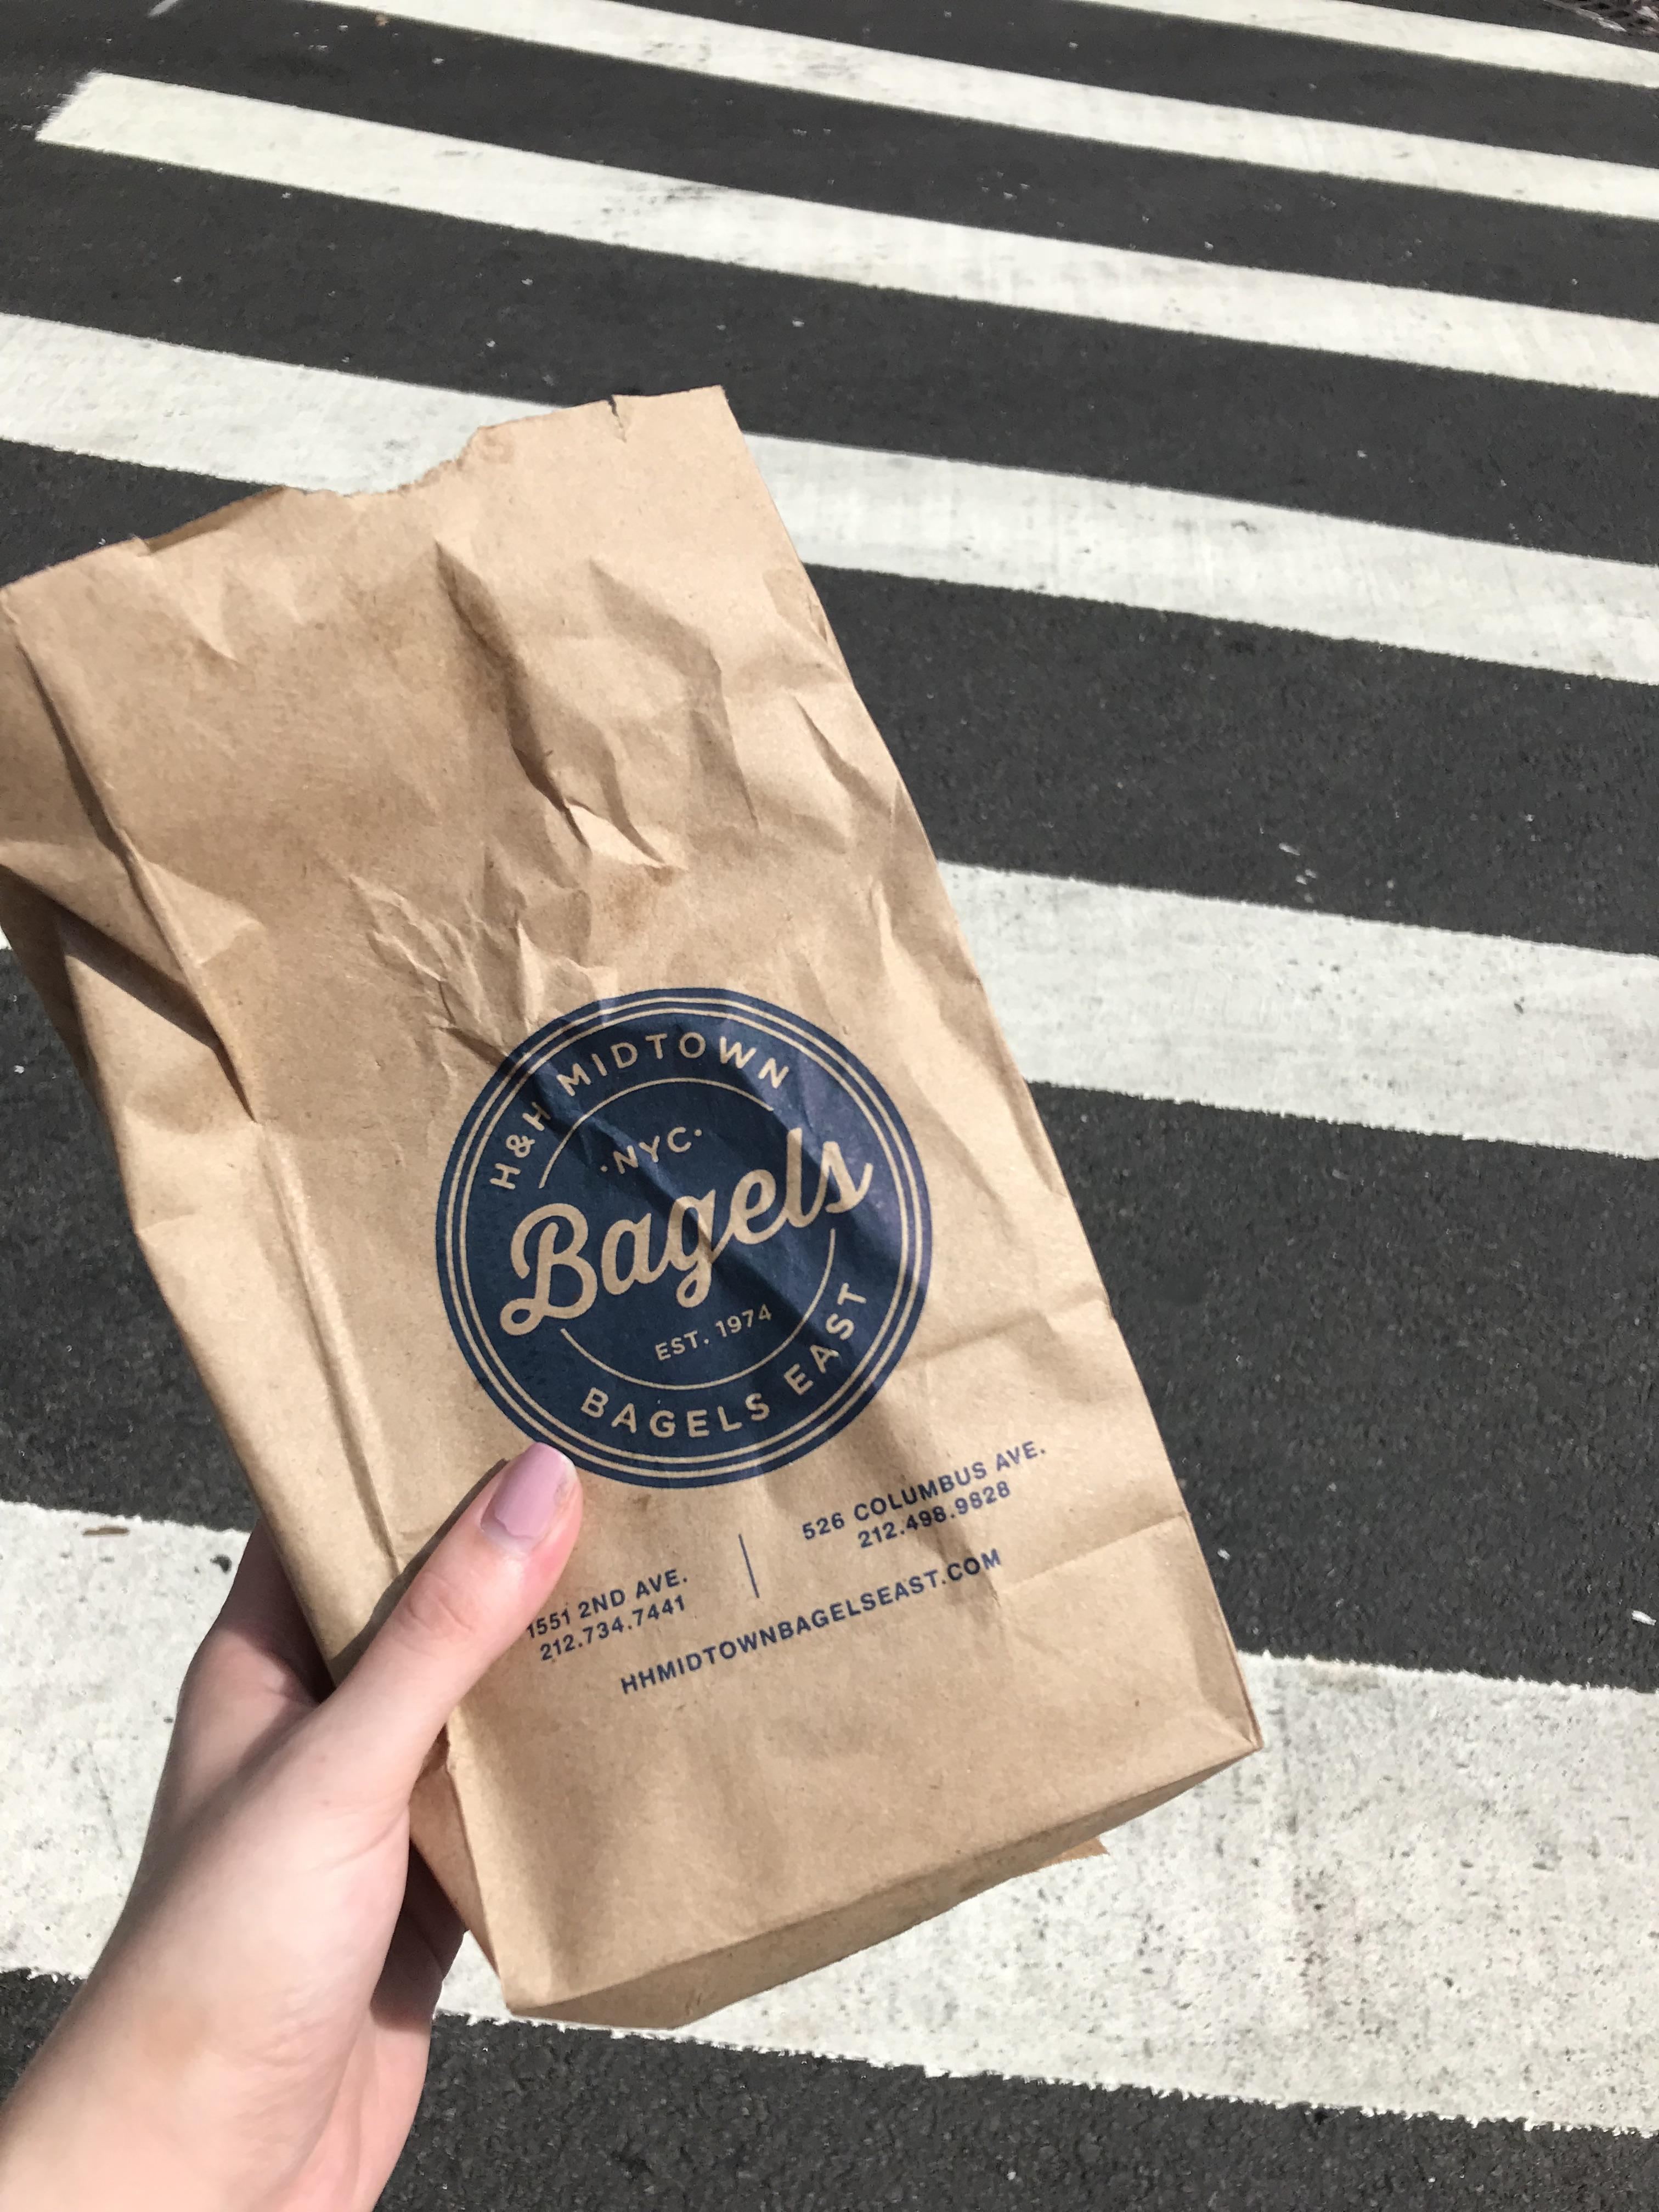 H&H Midtown Bagels - flaxccentuate.jpg